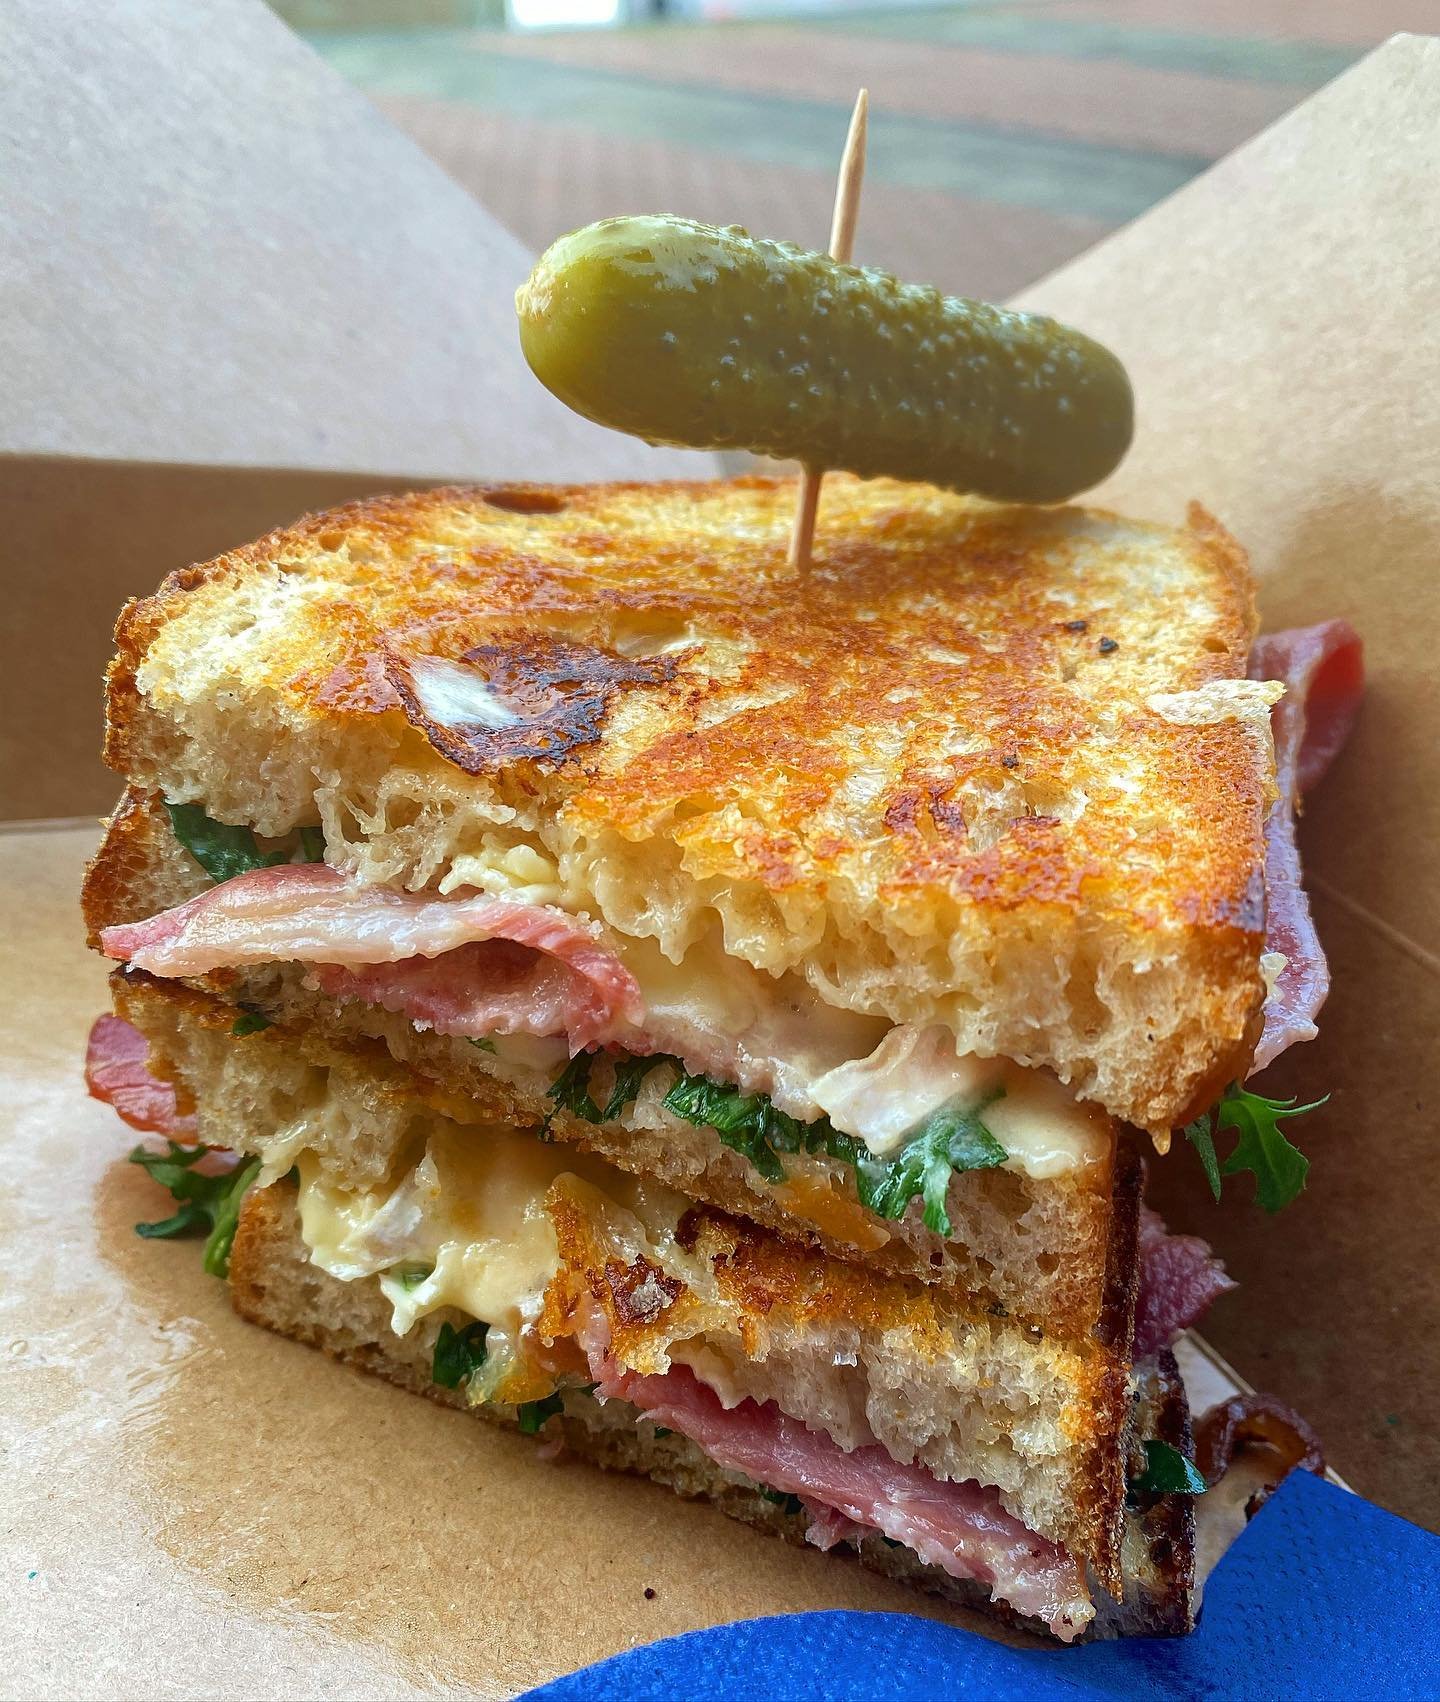 Sandwich in CAMBRIDGE